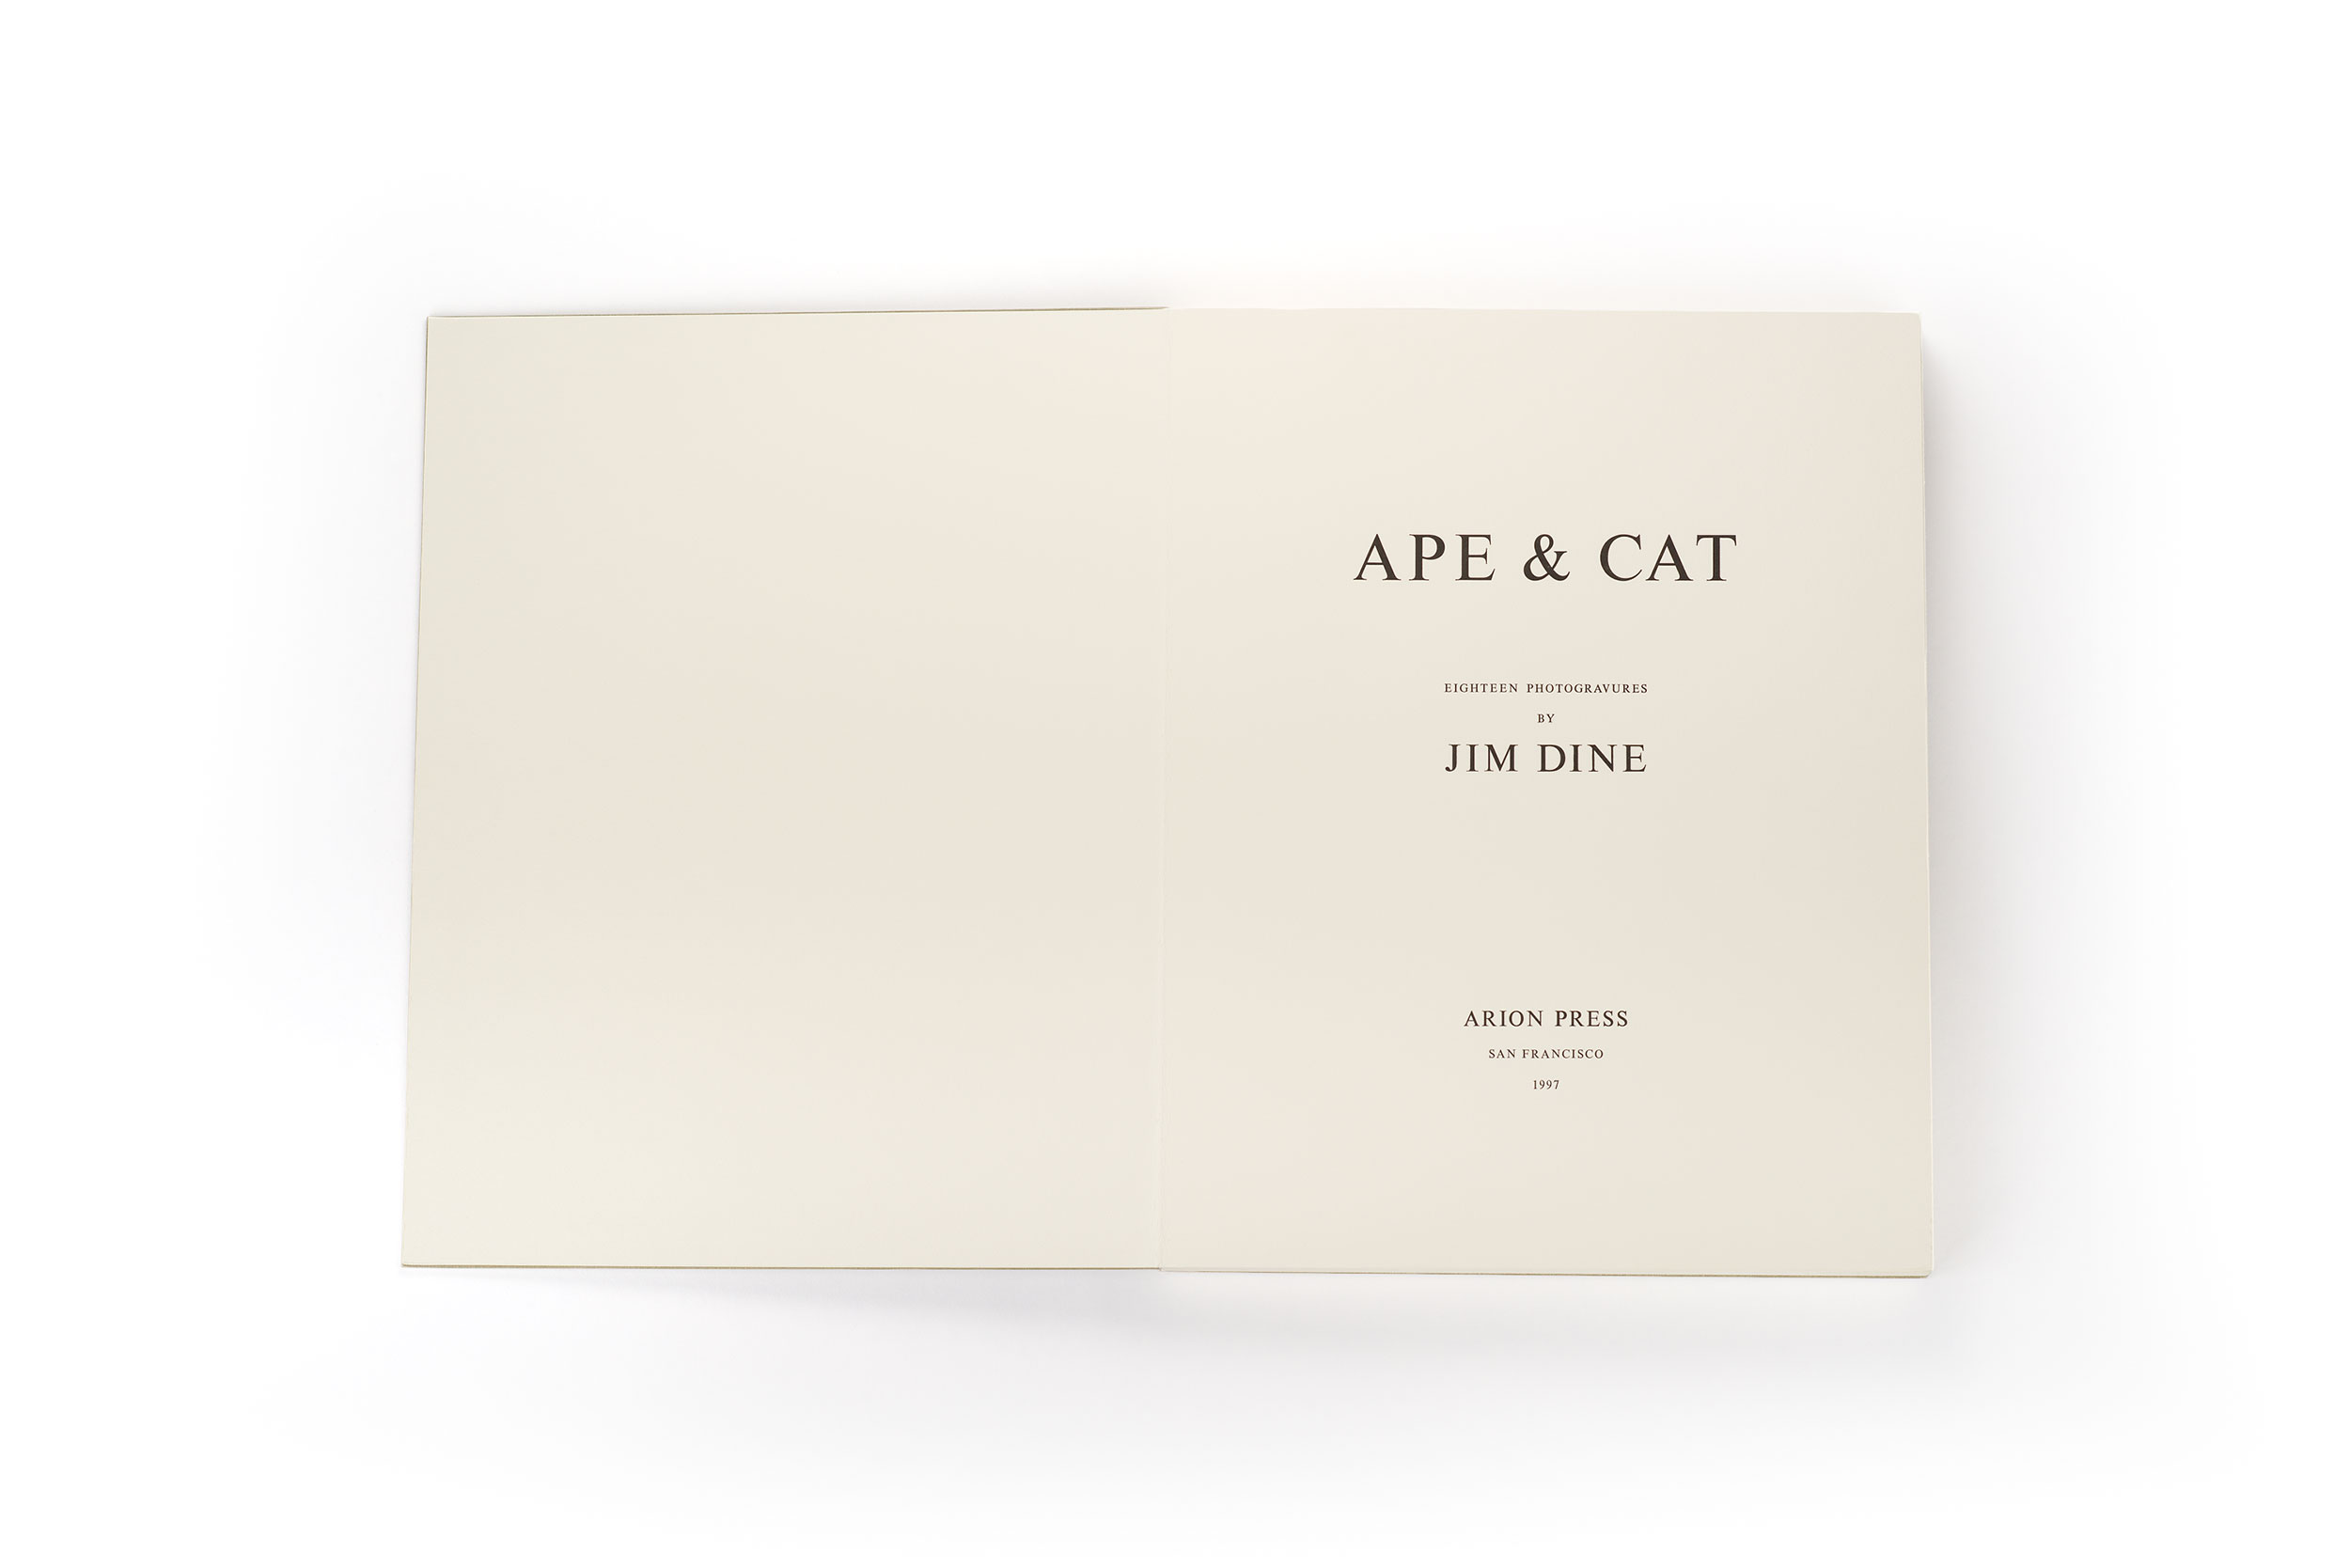 052_Ape-&-Cat-Title.jpg